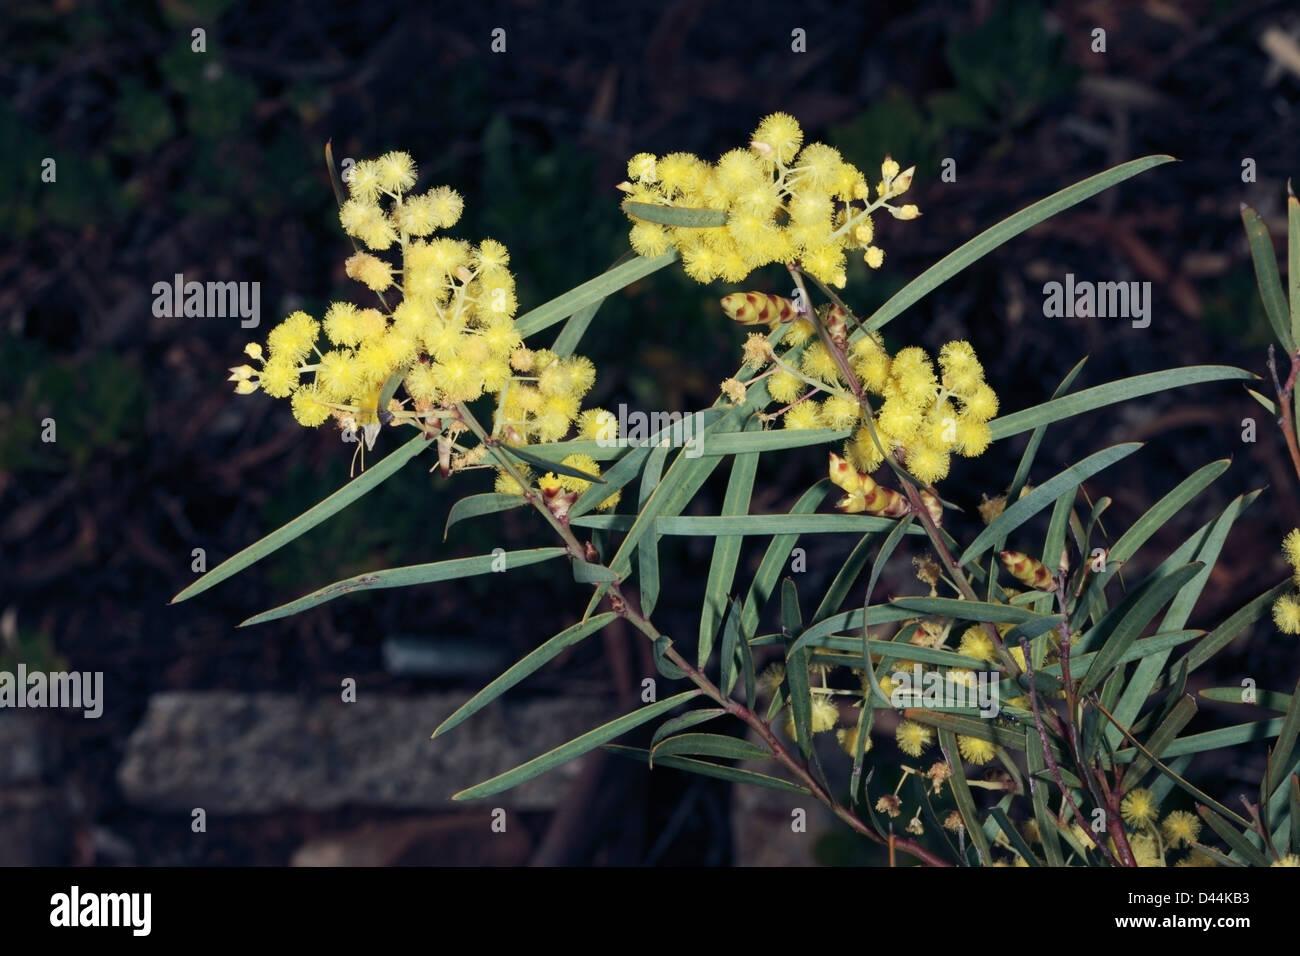 Acacia Iteaphyllaracosperma Iteaphyllum Flinders Range Wattle